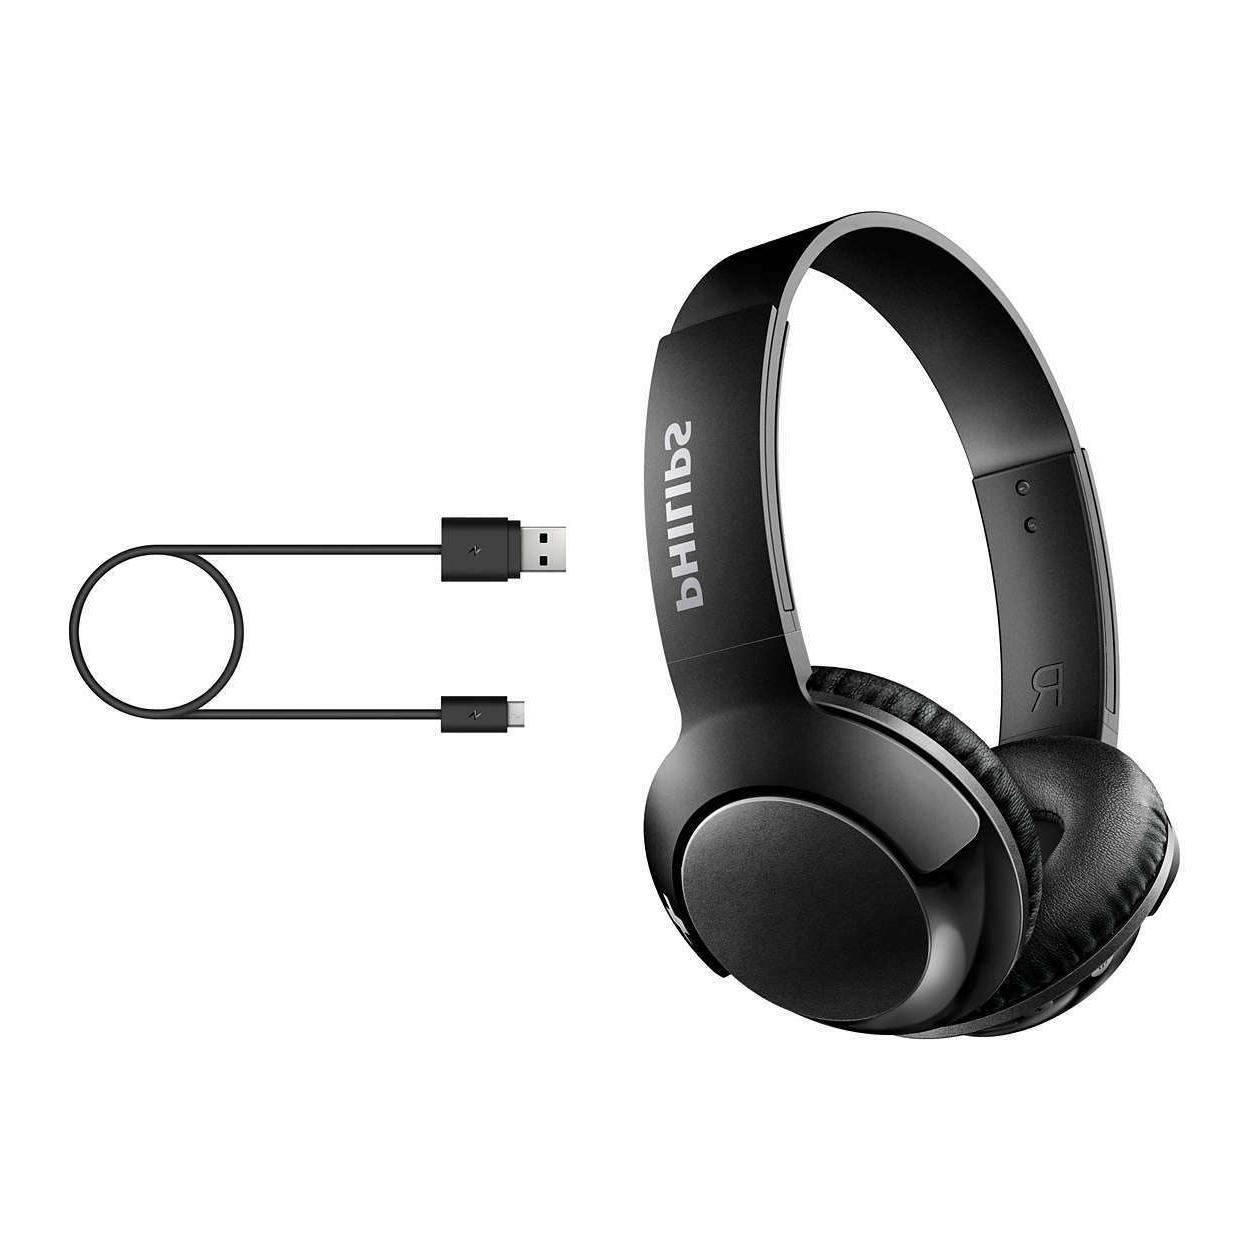 Philips Shb3075 Extra Bass Bluetooth Wireless On Ear Headphones